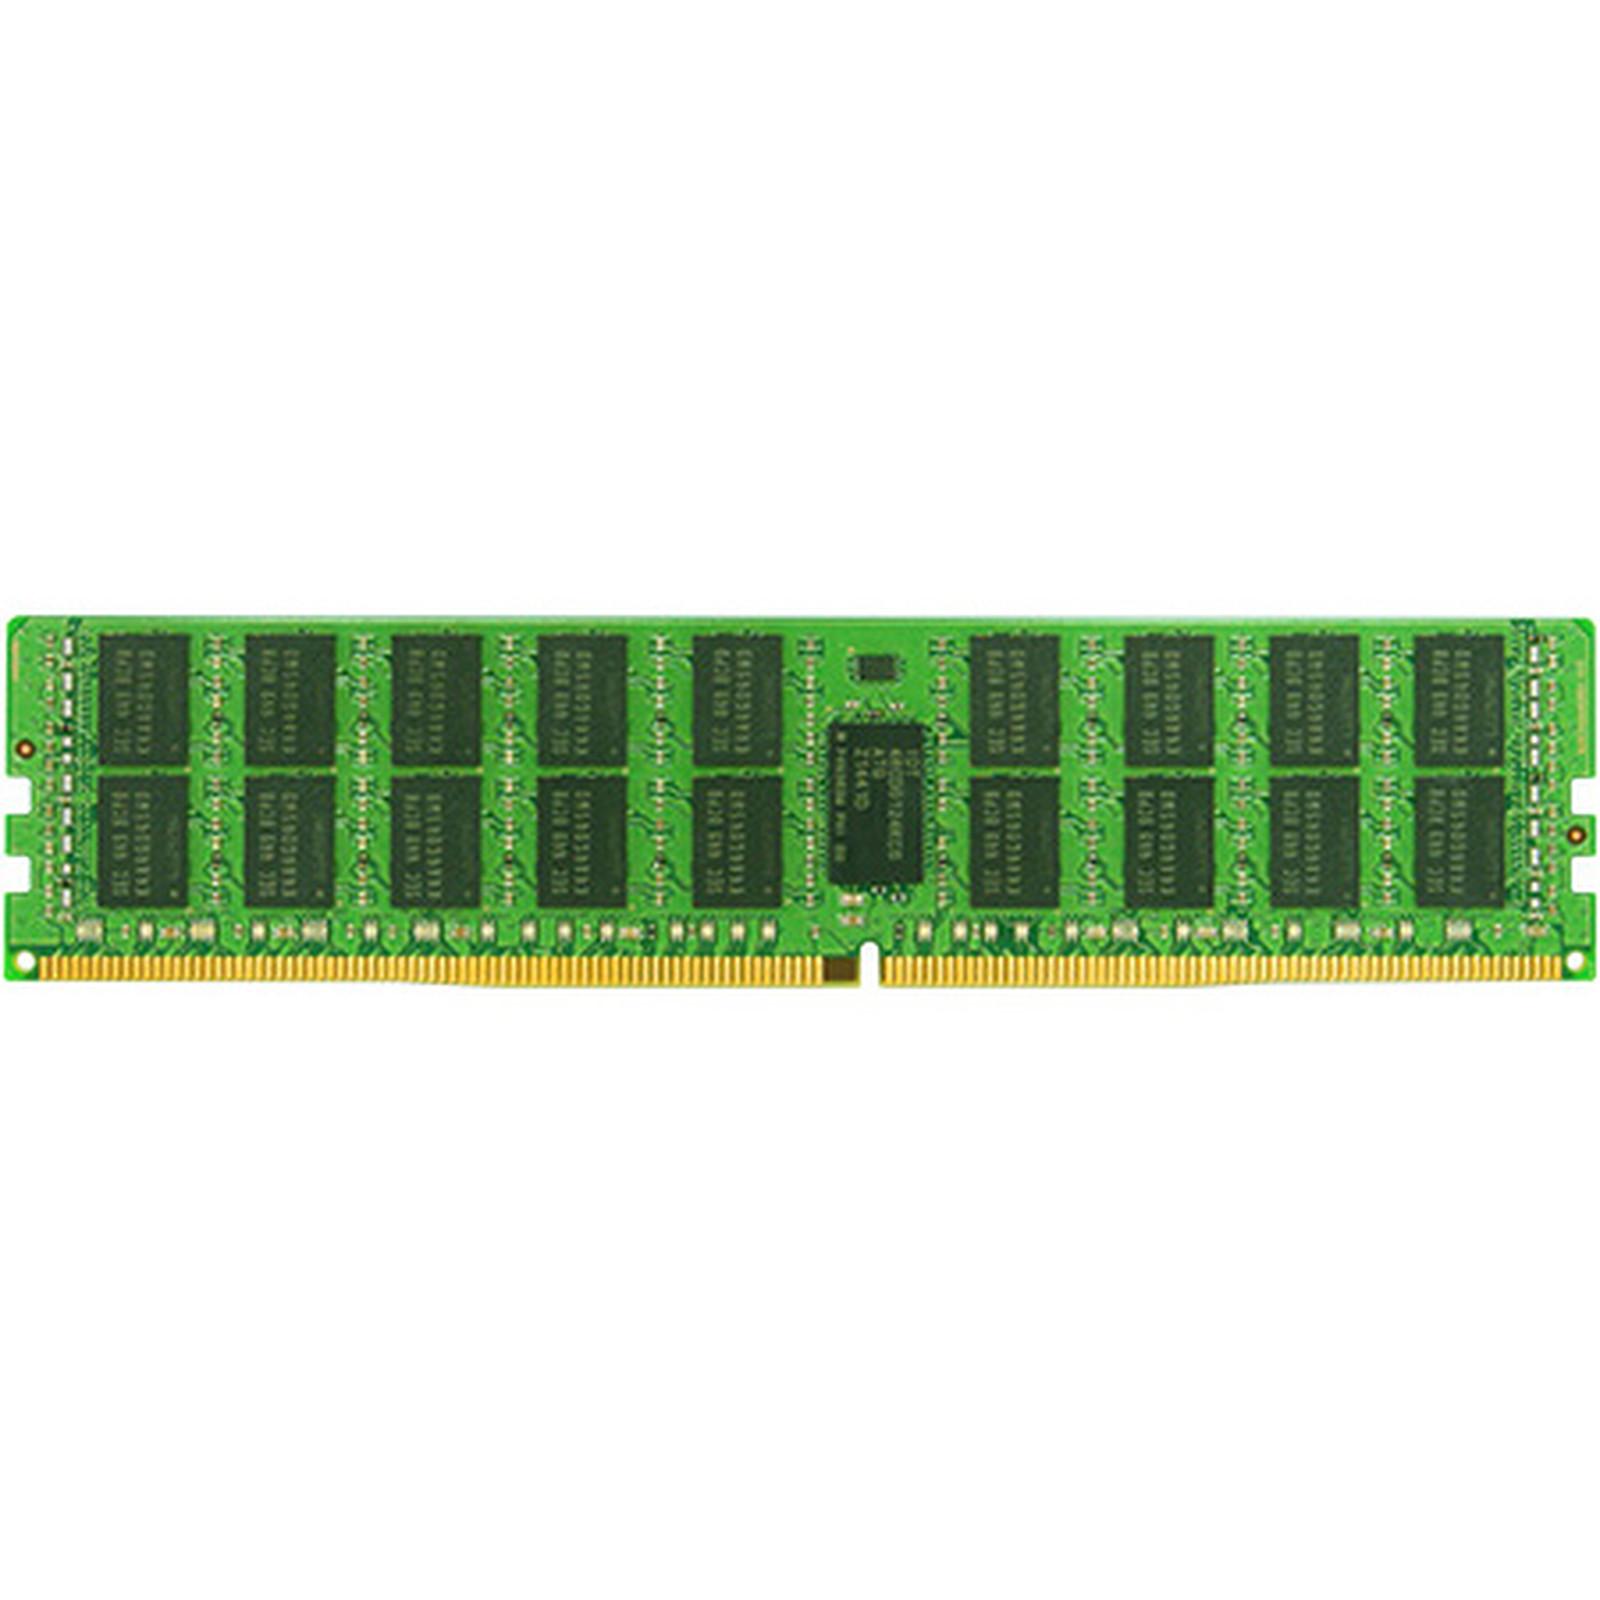 Synology 32 GB (1 x 32 GB) DDR4 ECC RDIMM 2666 MHz (D4RD-2666-32G)